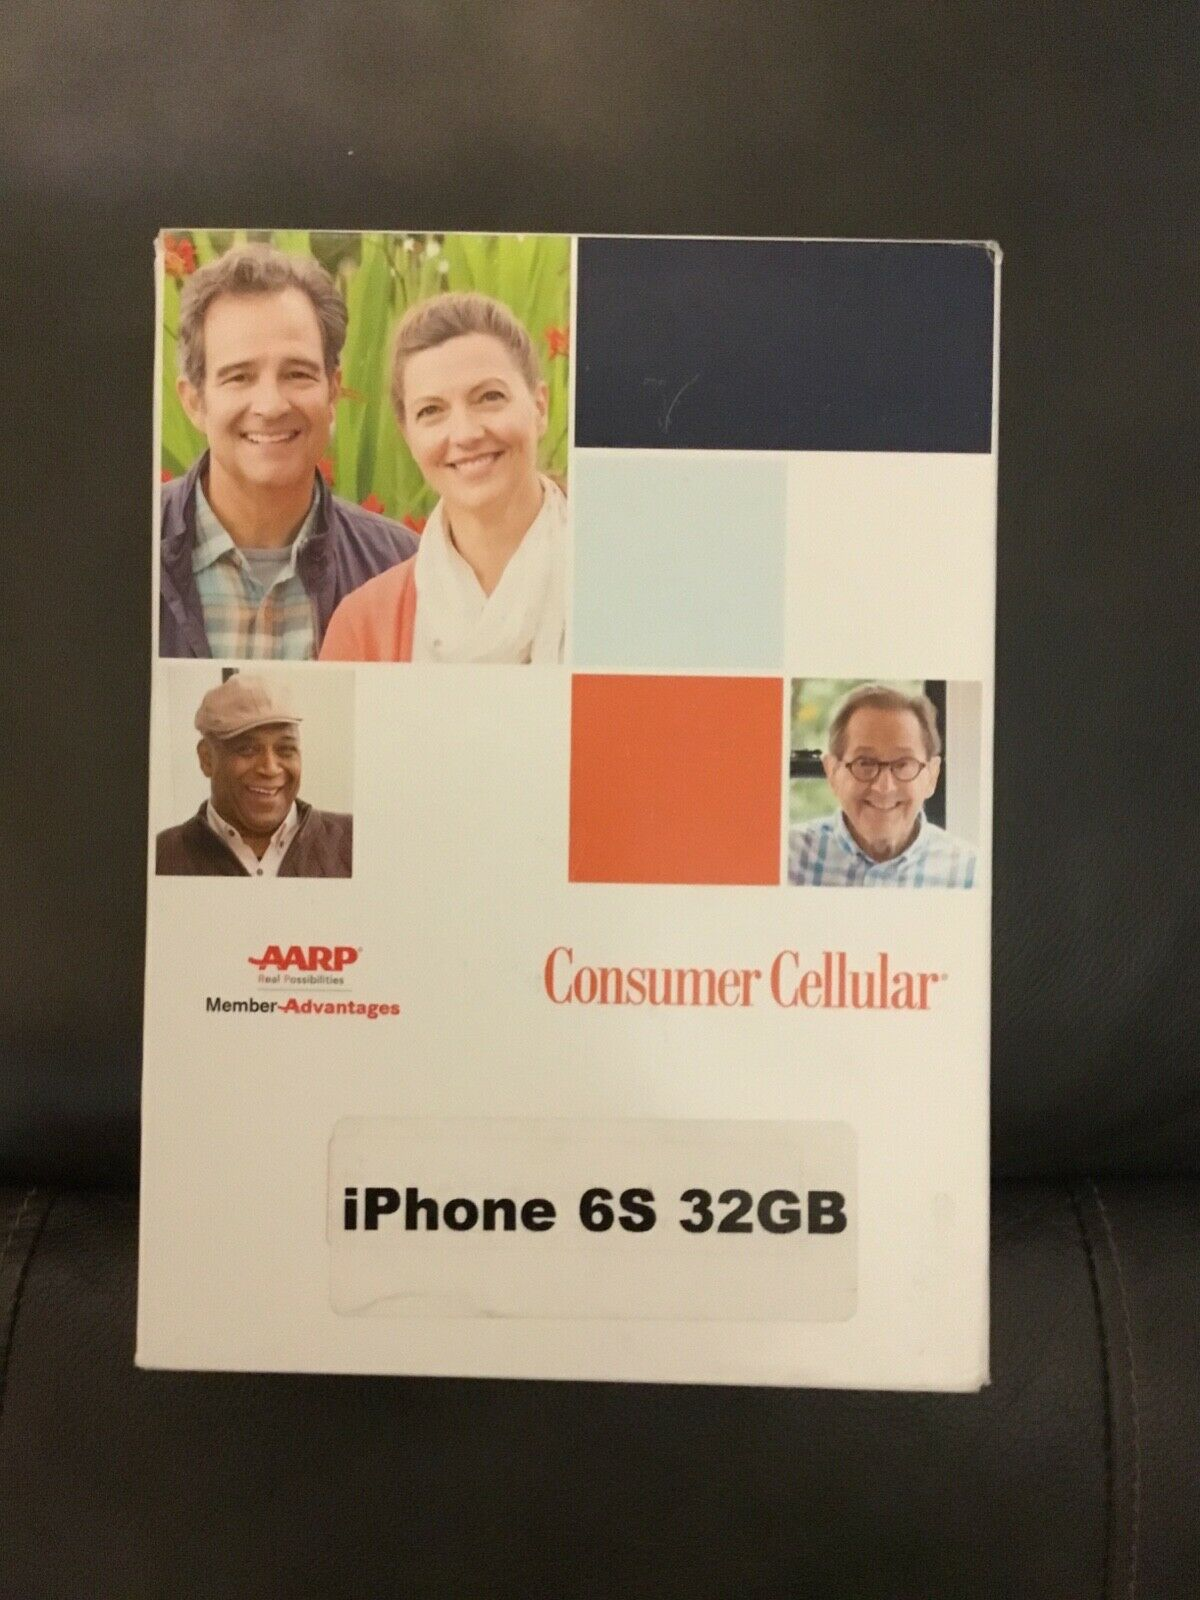 Consumer Cellular Apple iPhone 6S 32GB - Space Gray brand ne